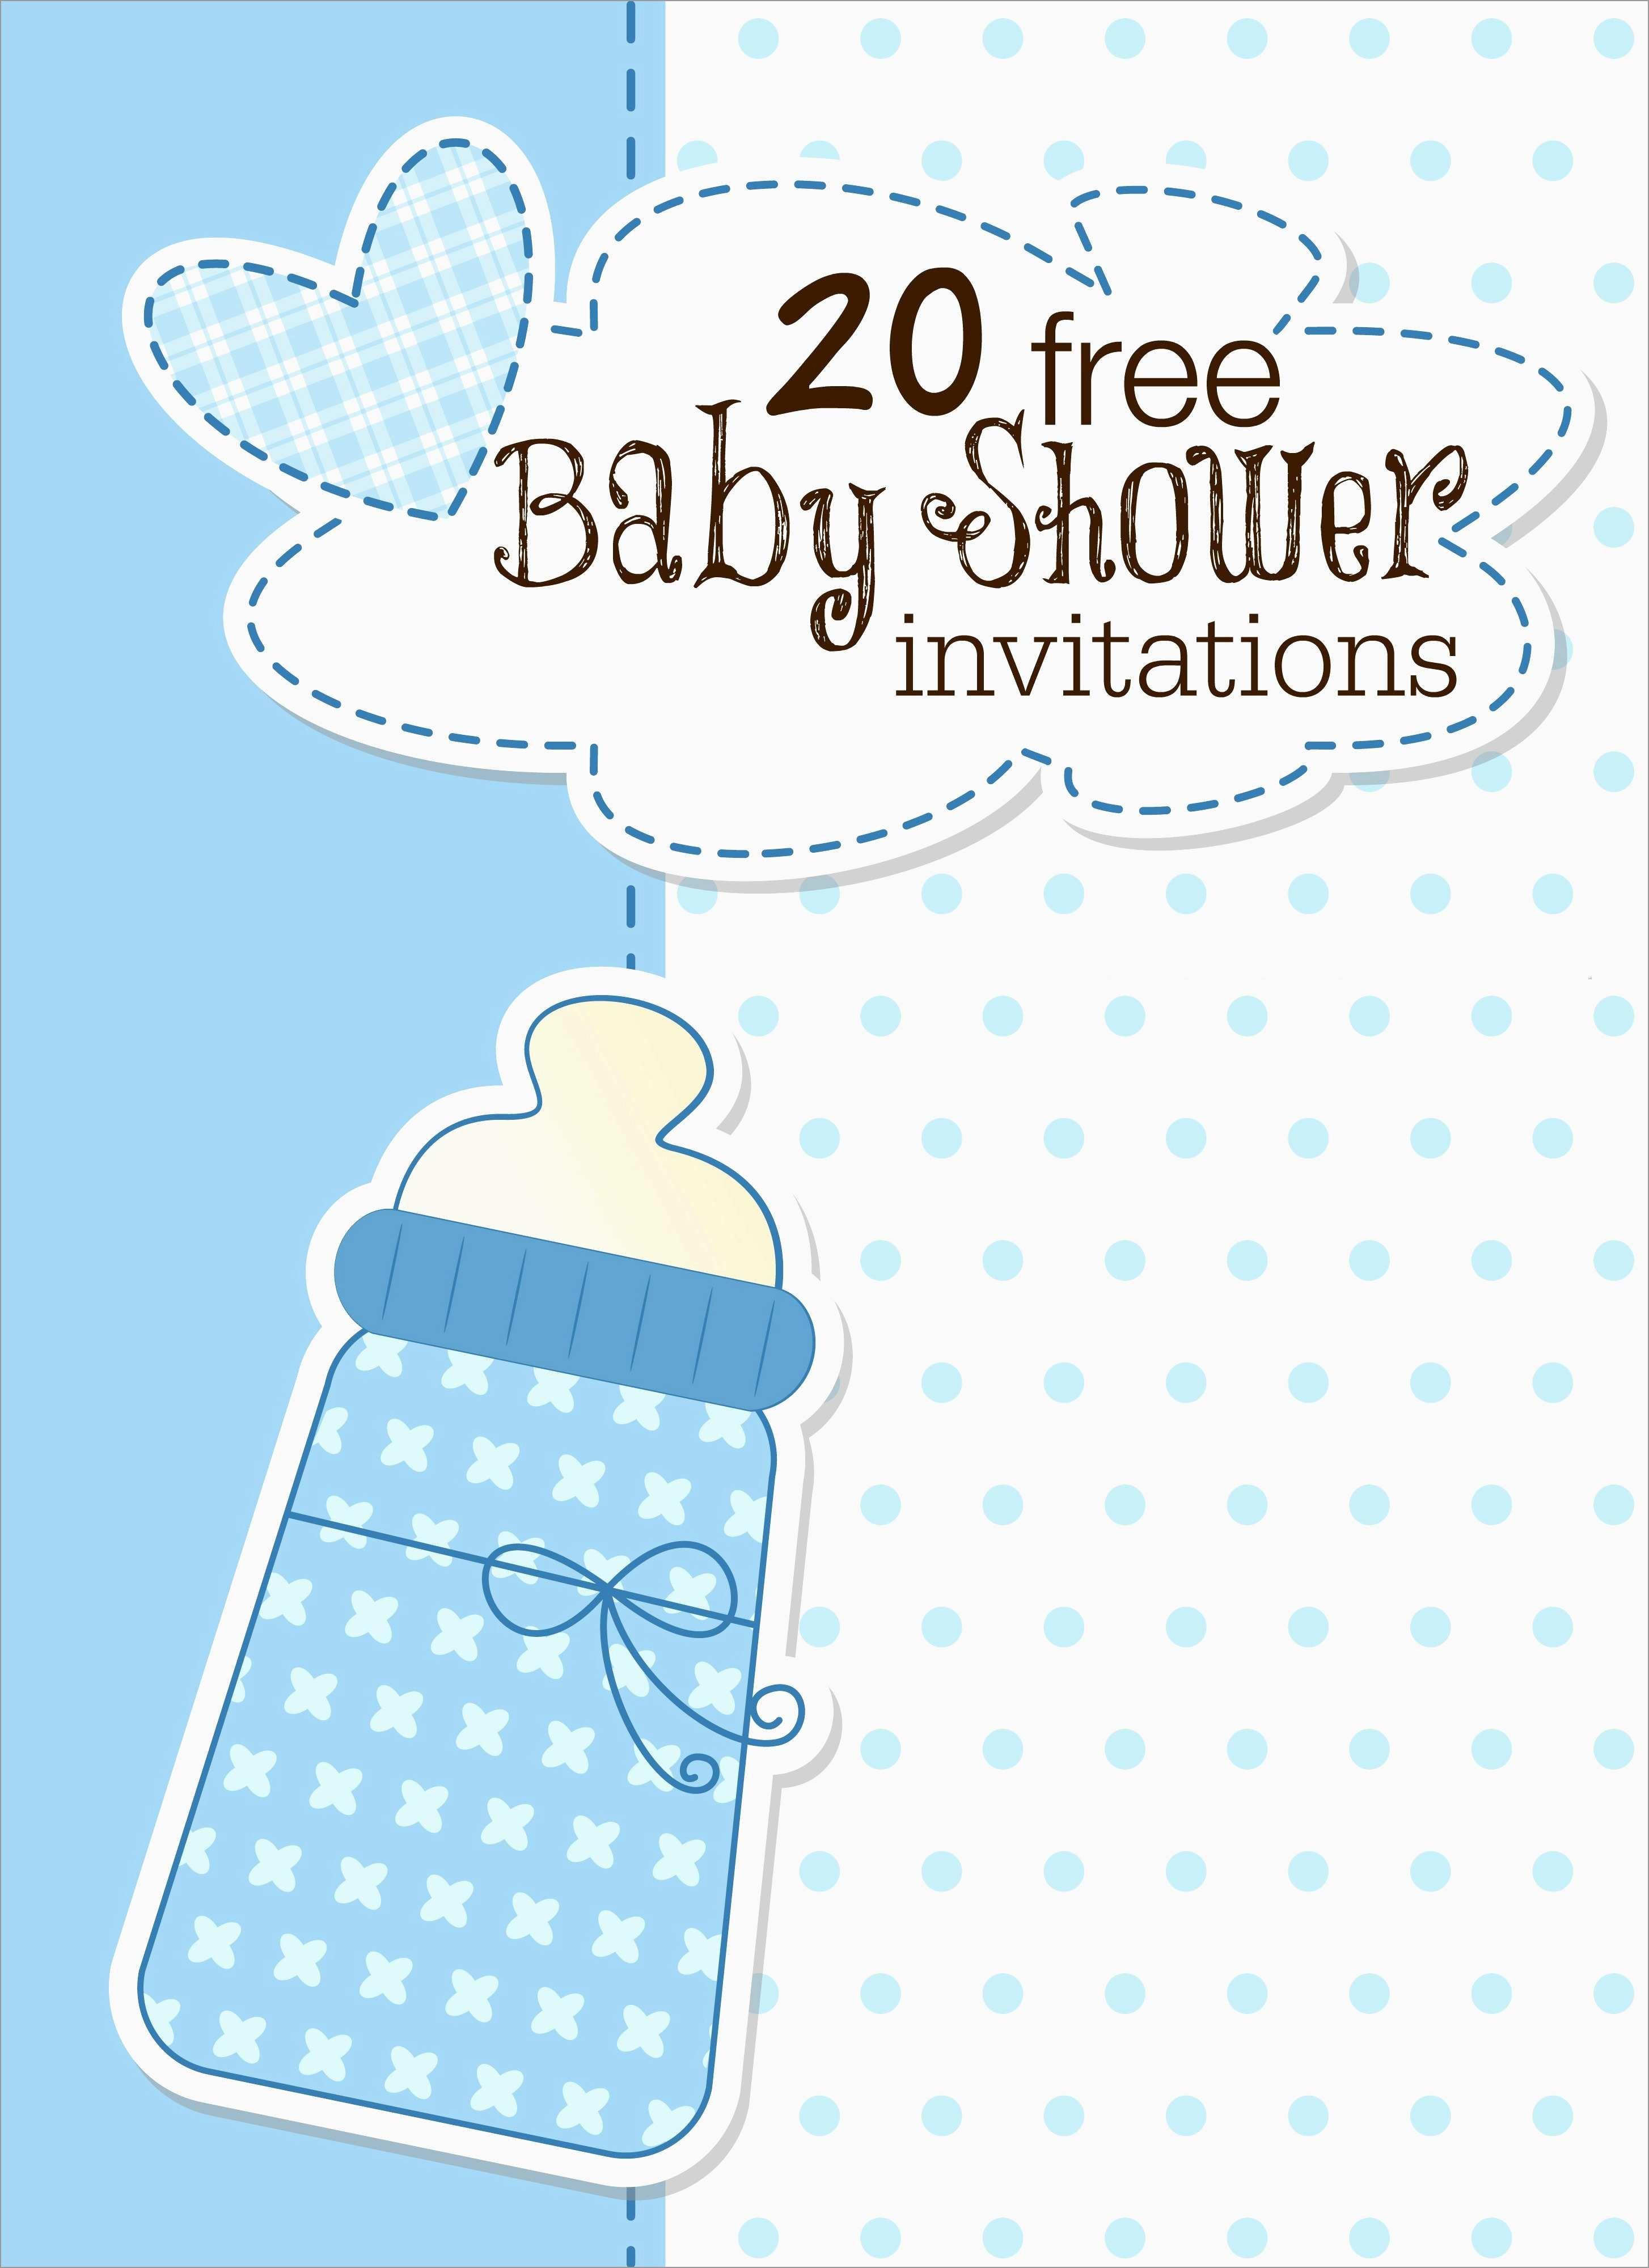 Elegant Free Printable Baby Shower Invitations Templates For Boys - Free Printable Baby Shower Invitations Templates